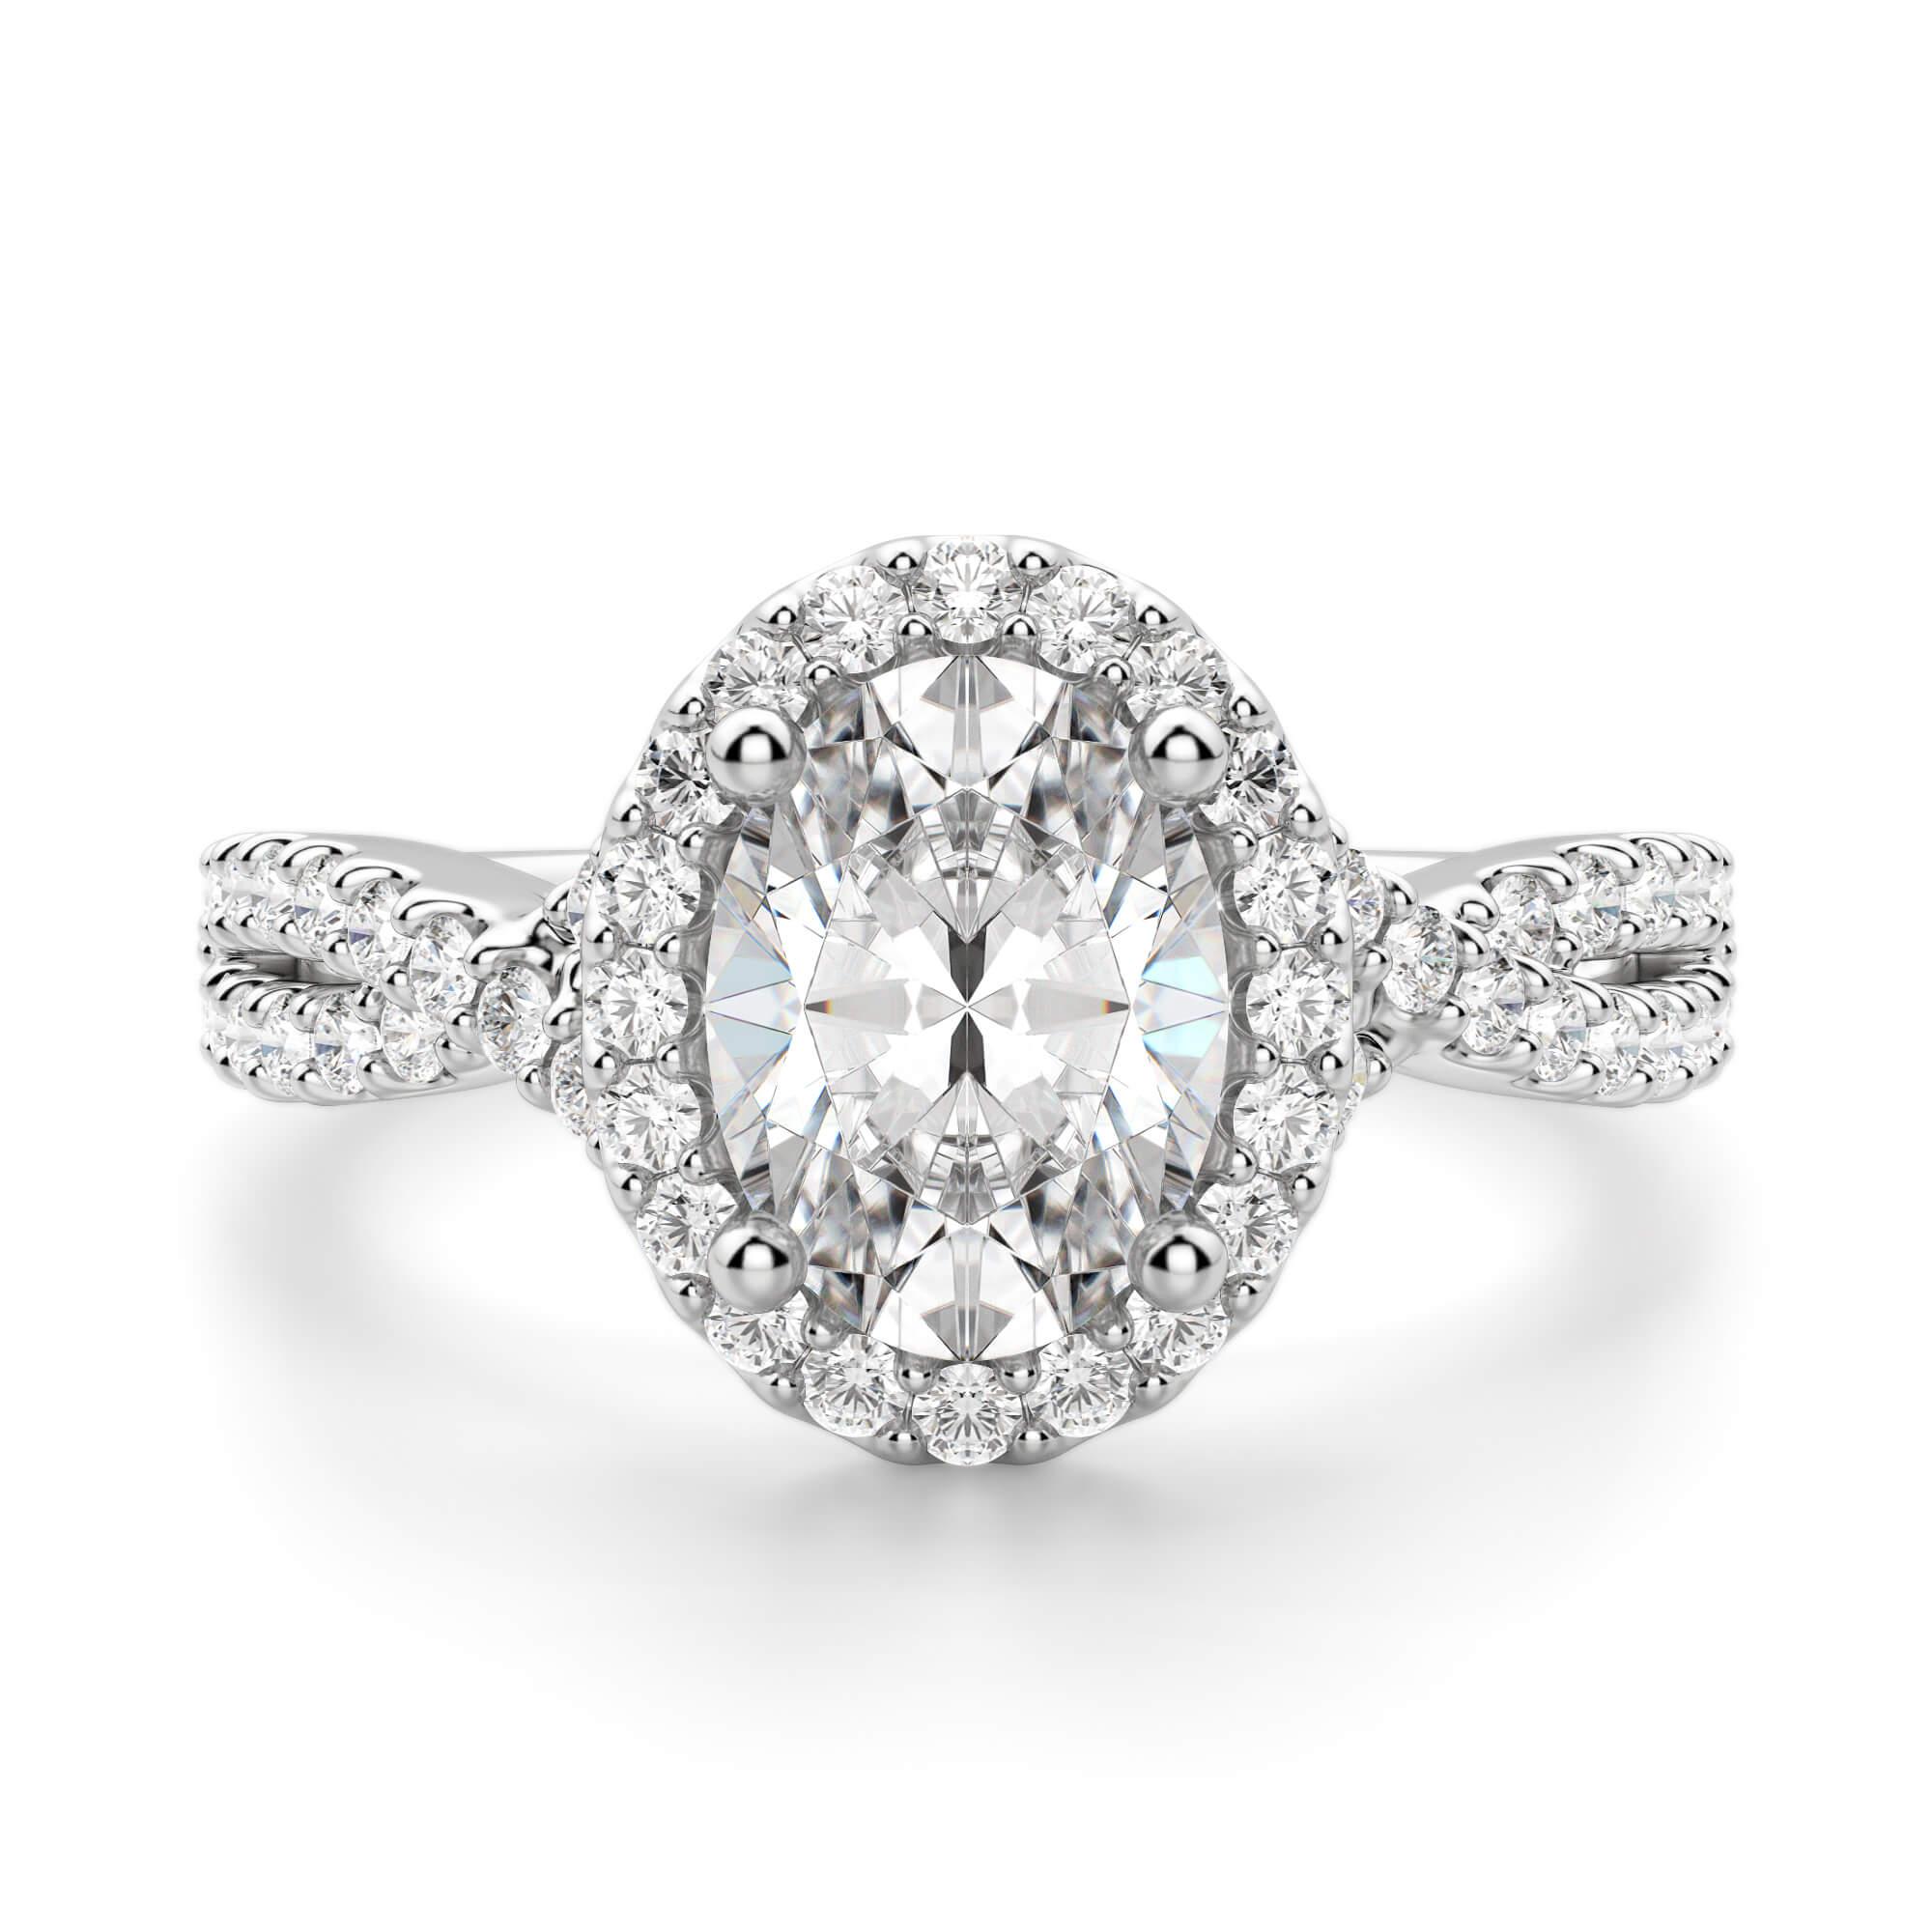 Capri Oval Cut Engagement Ring